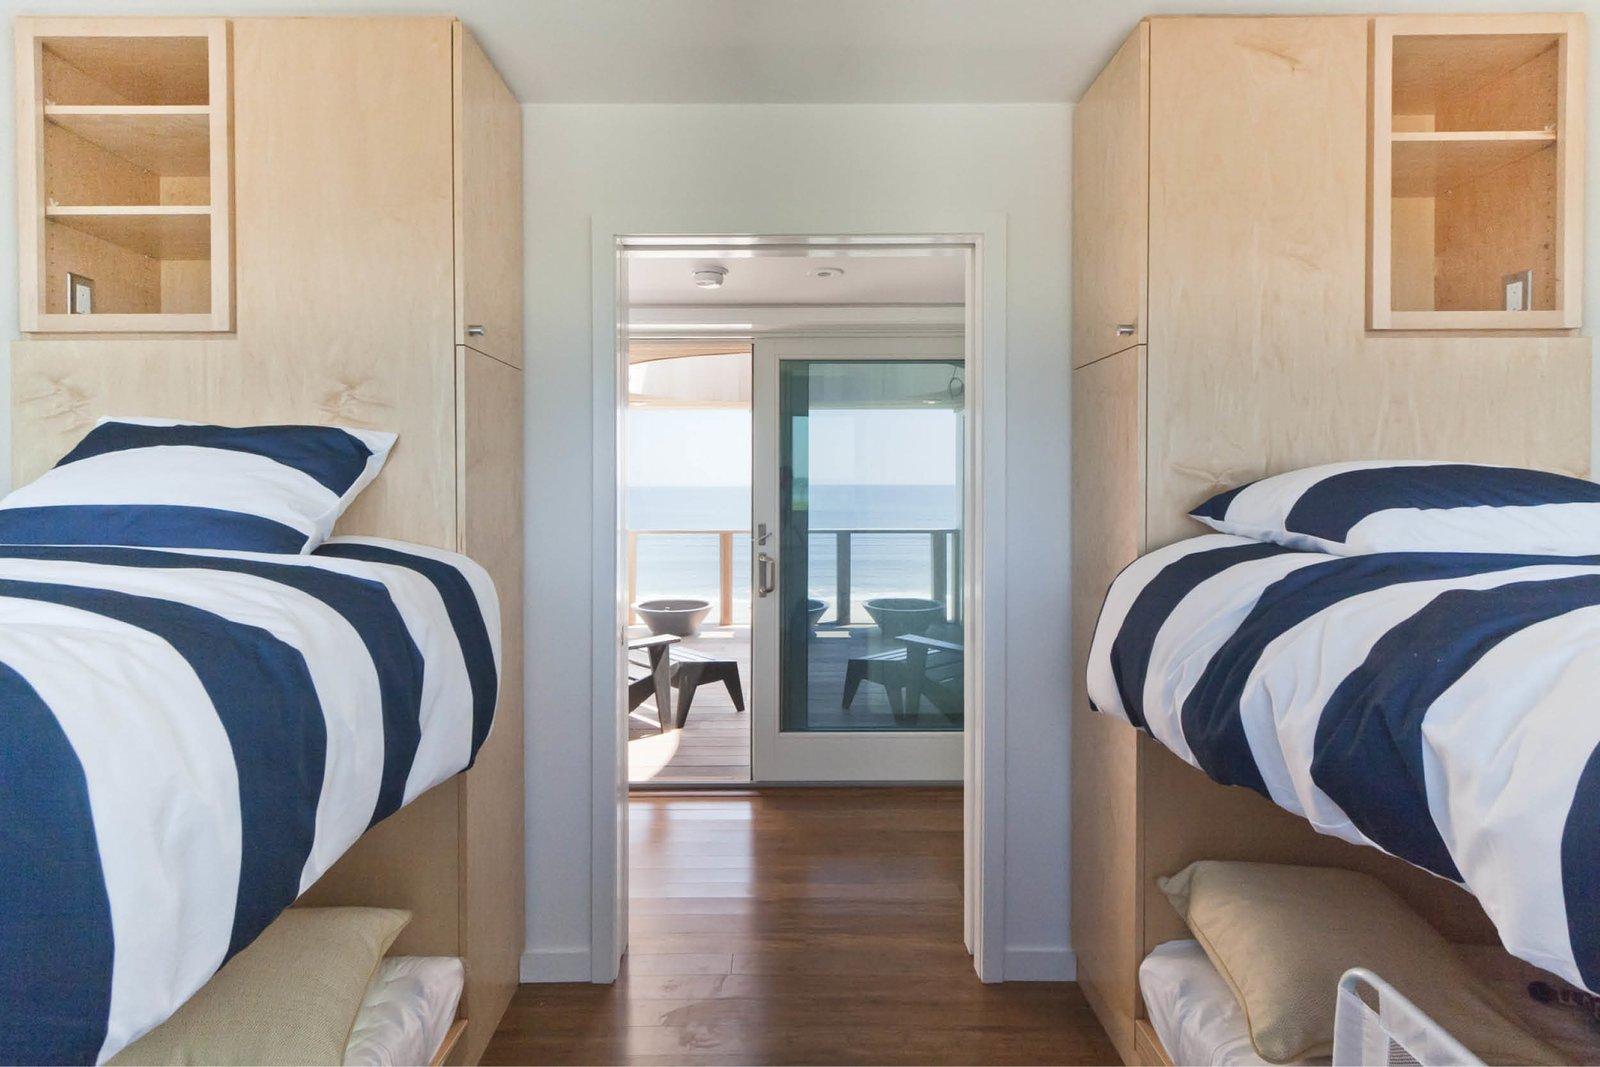 Bed, Storage, Bunks, Wardrobe, Medium Hardwood Floor, Kids Room, and Bedroom Room Type Bunk room with oculus deck and ocean beyond  Dune Road Beach House by Resolution: 4 Architecture